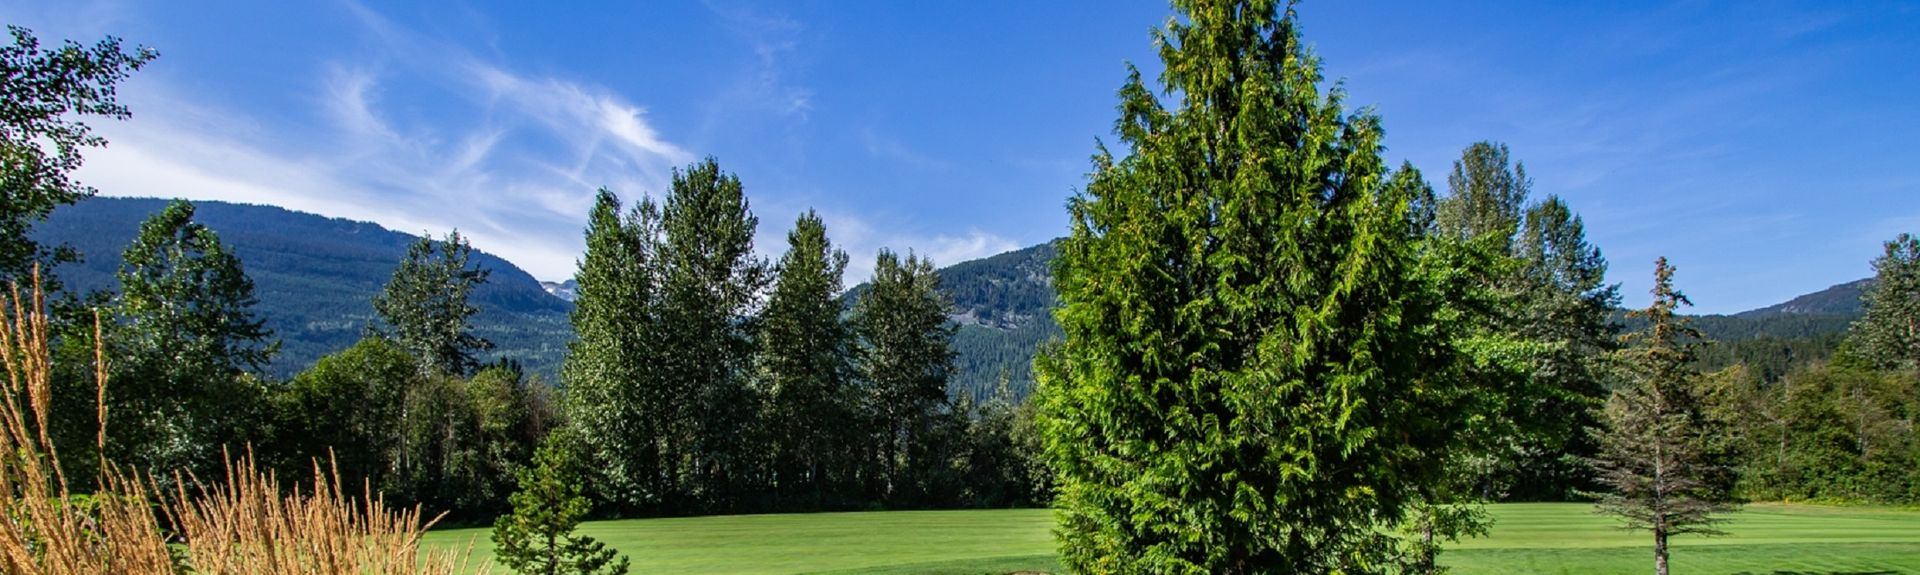 Nicklaus North, Whistler, British Columbia, Canada